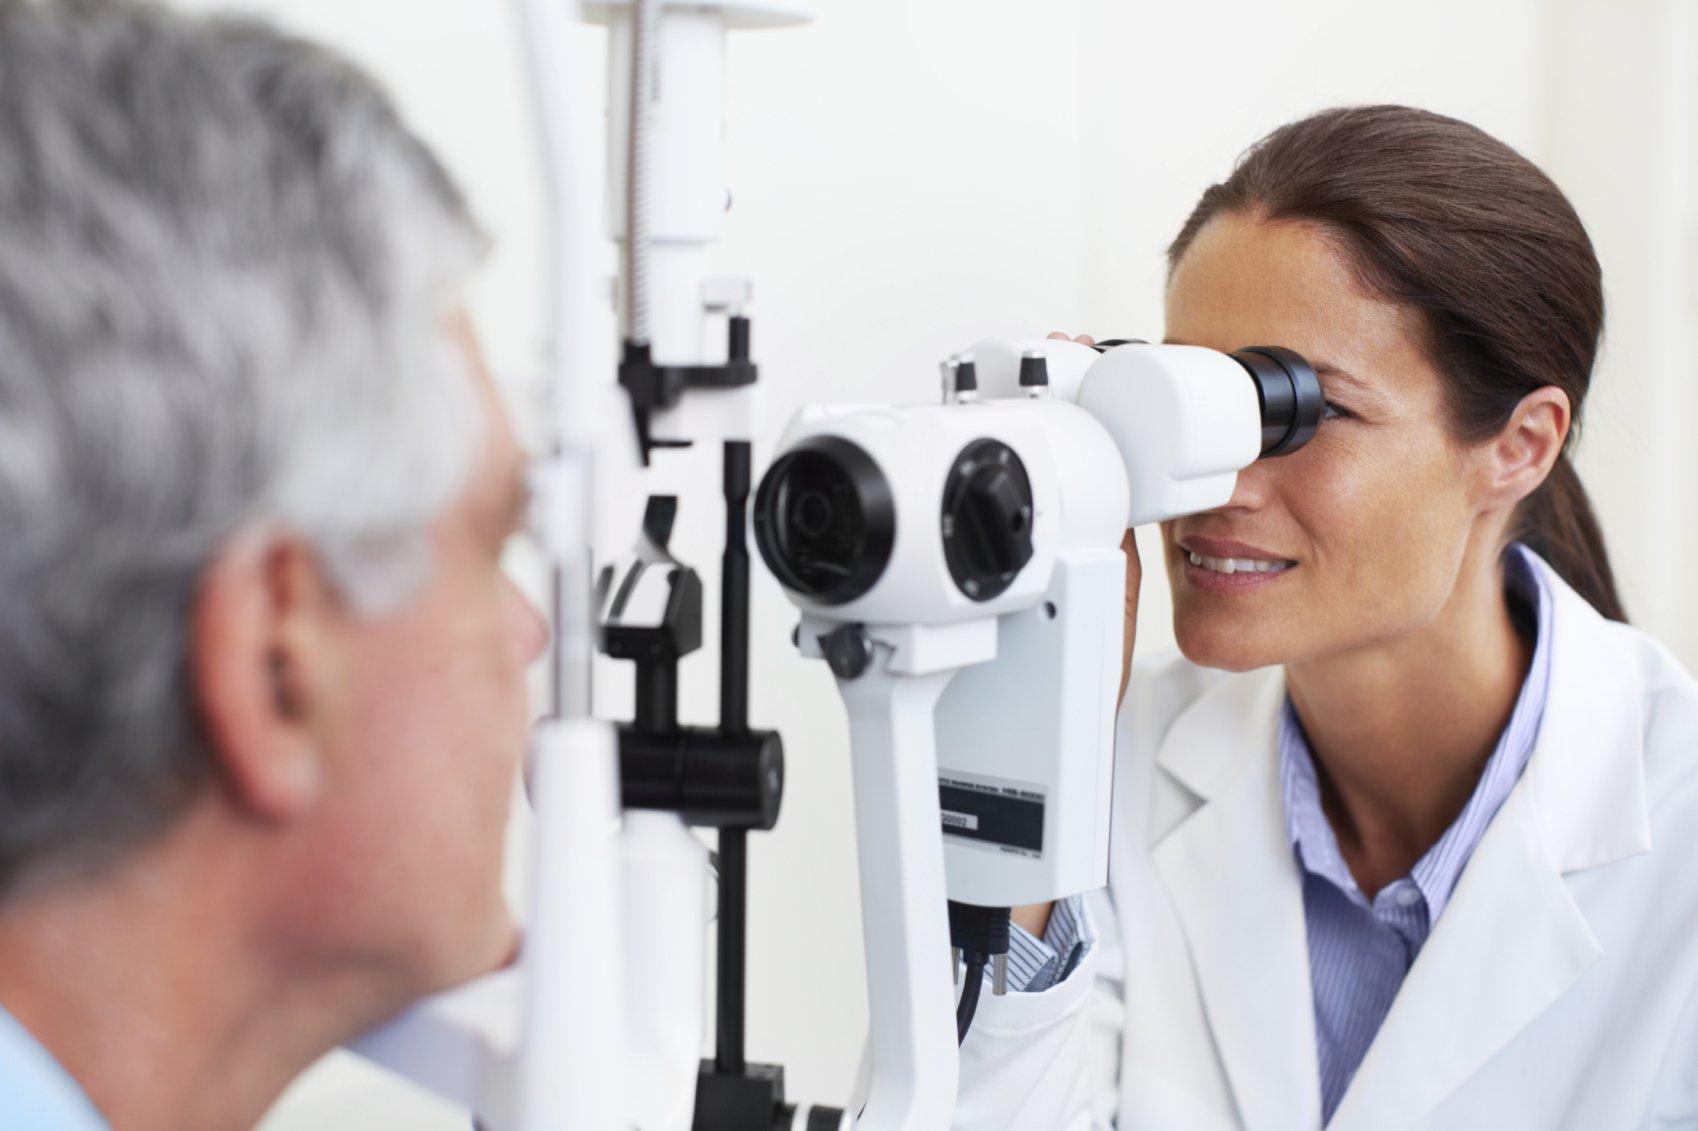 Wat CareConnect Ophthalmologist u biedt